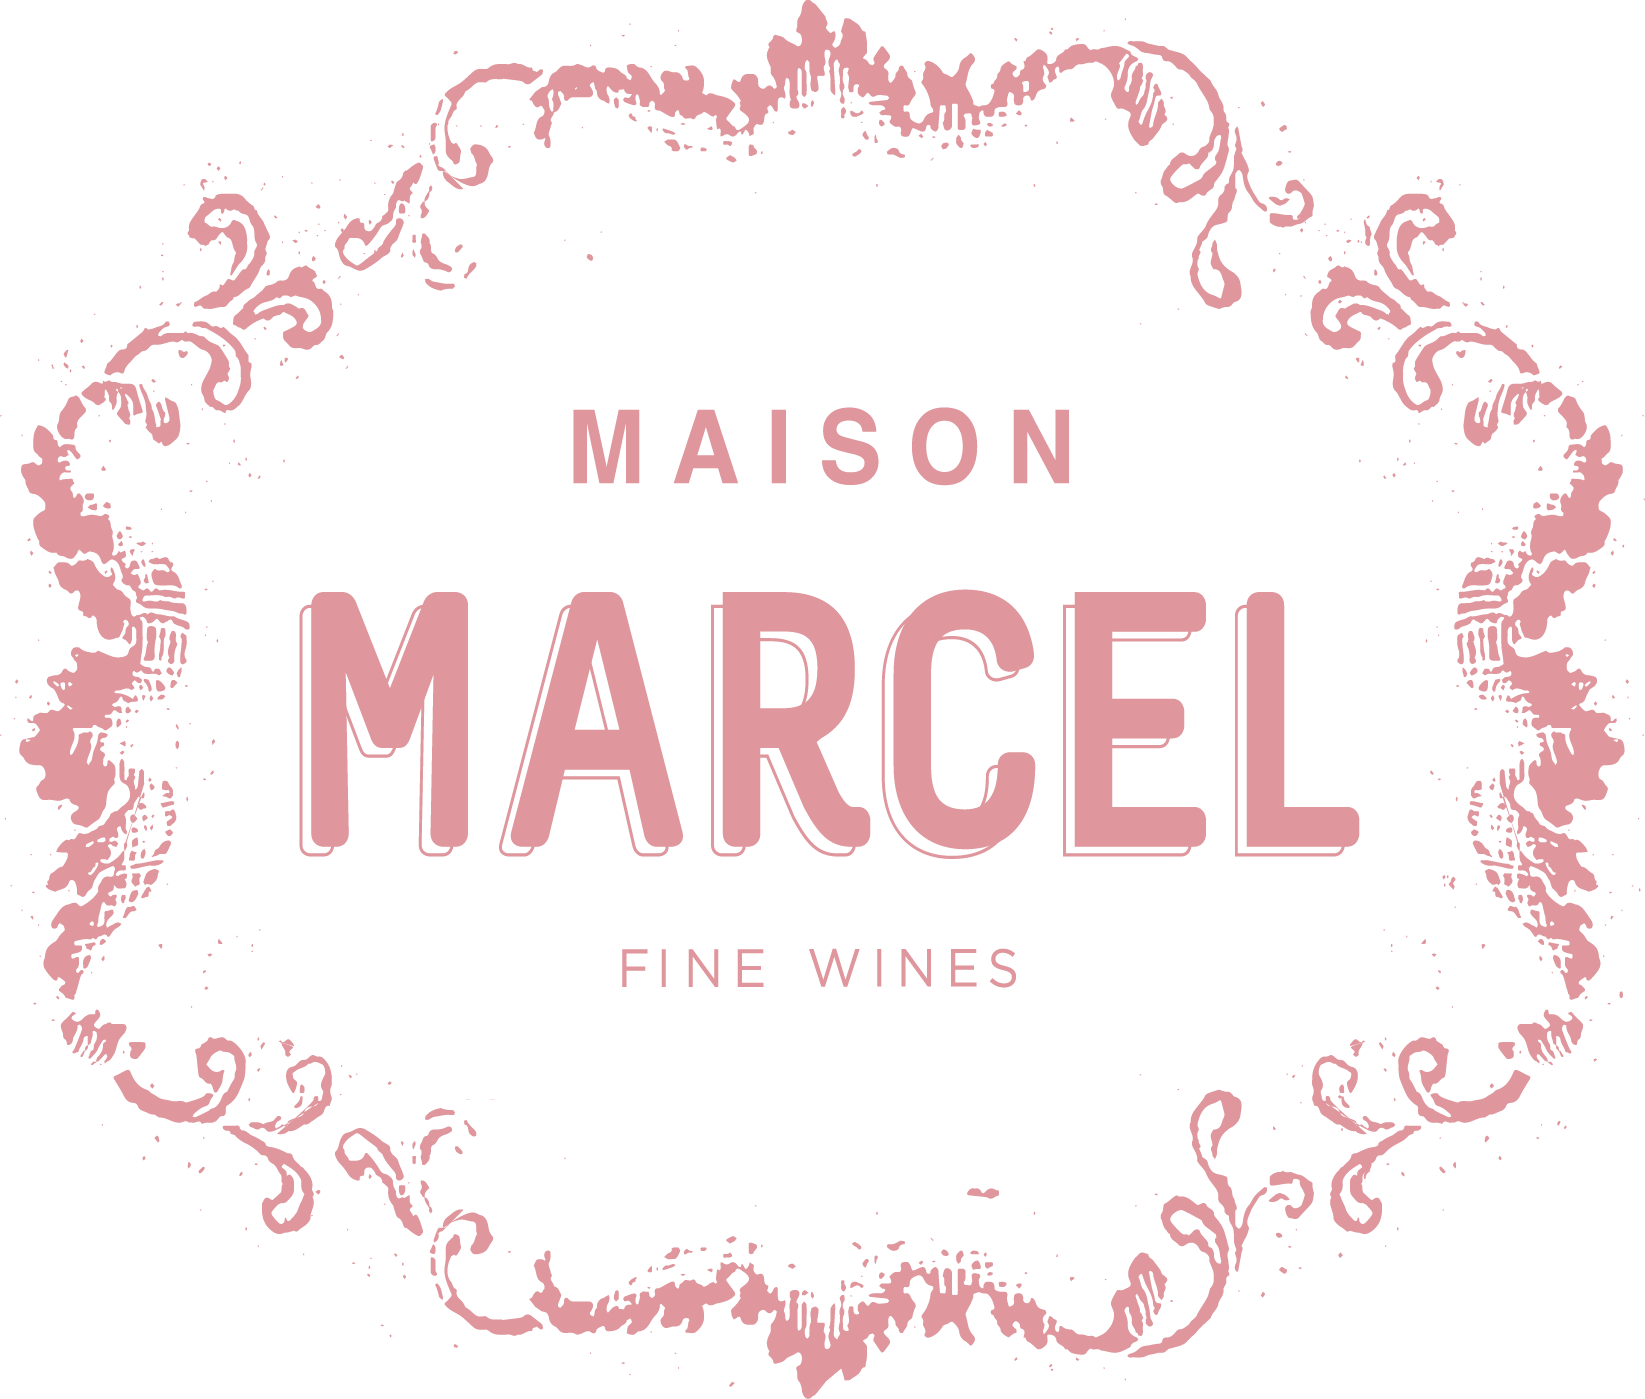 drinkmarcel.com  -  Instagram Maison Marcel  -   Facebook Maison Marcel